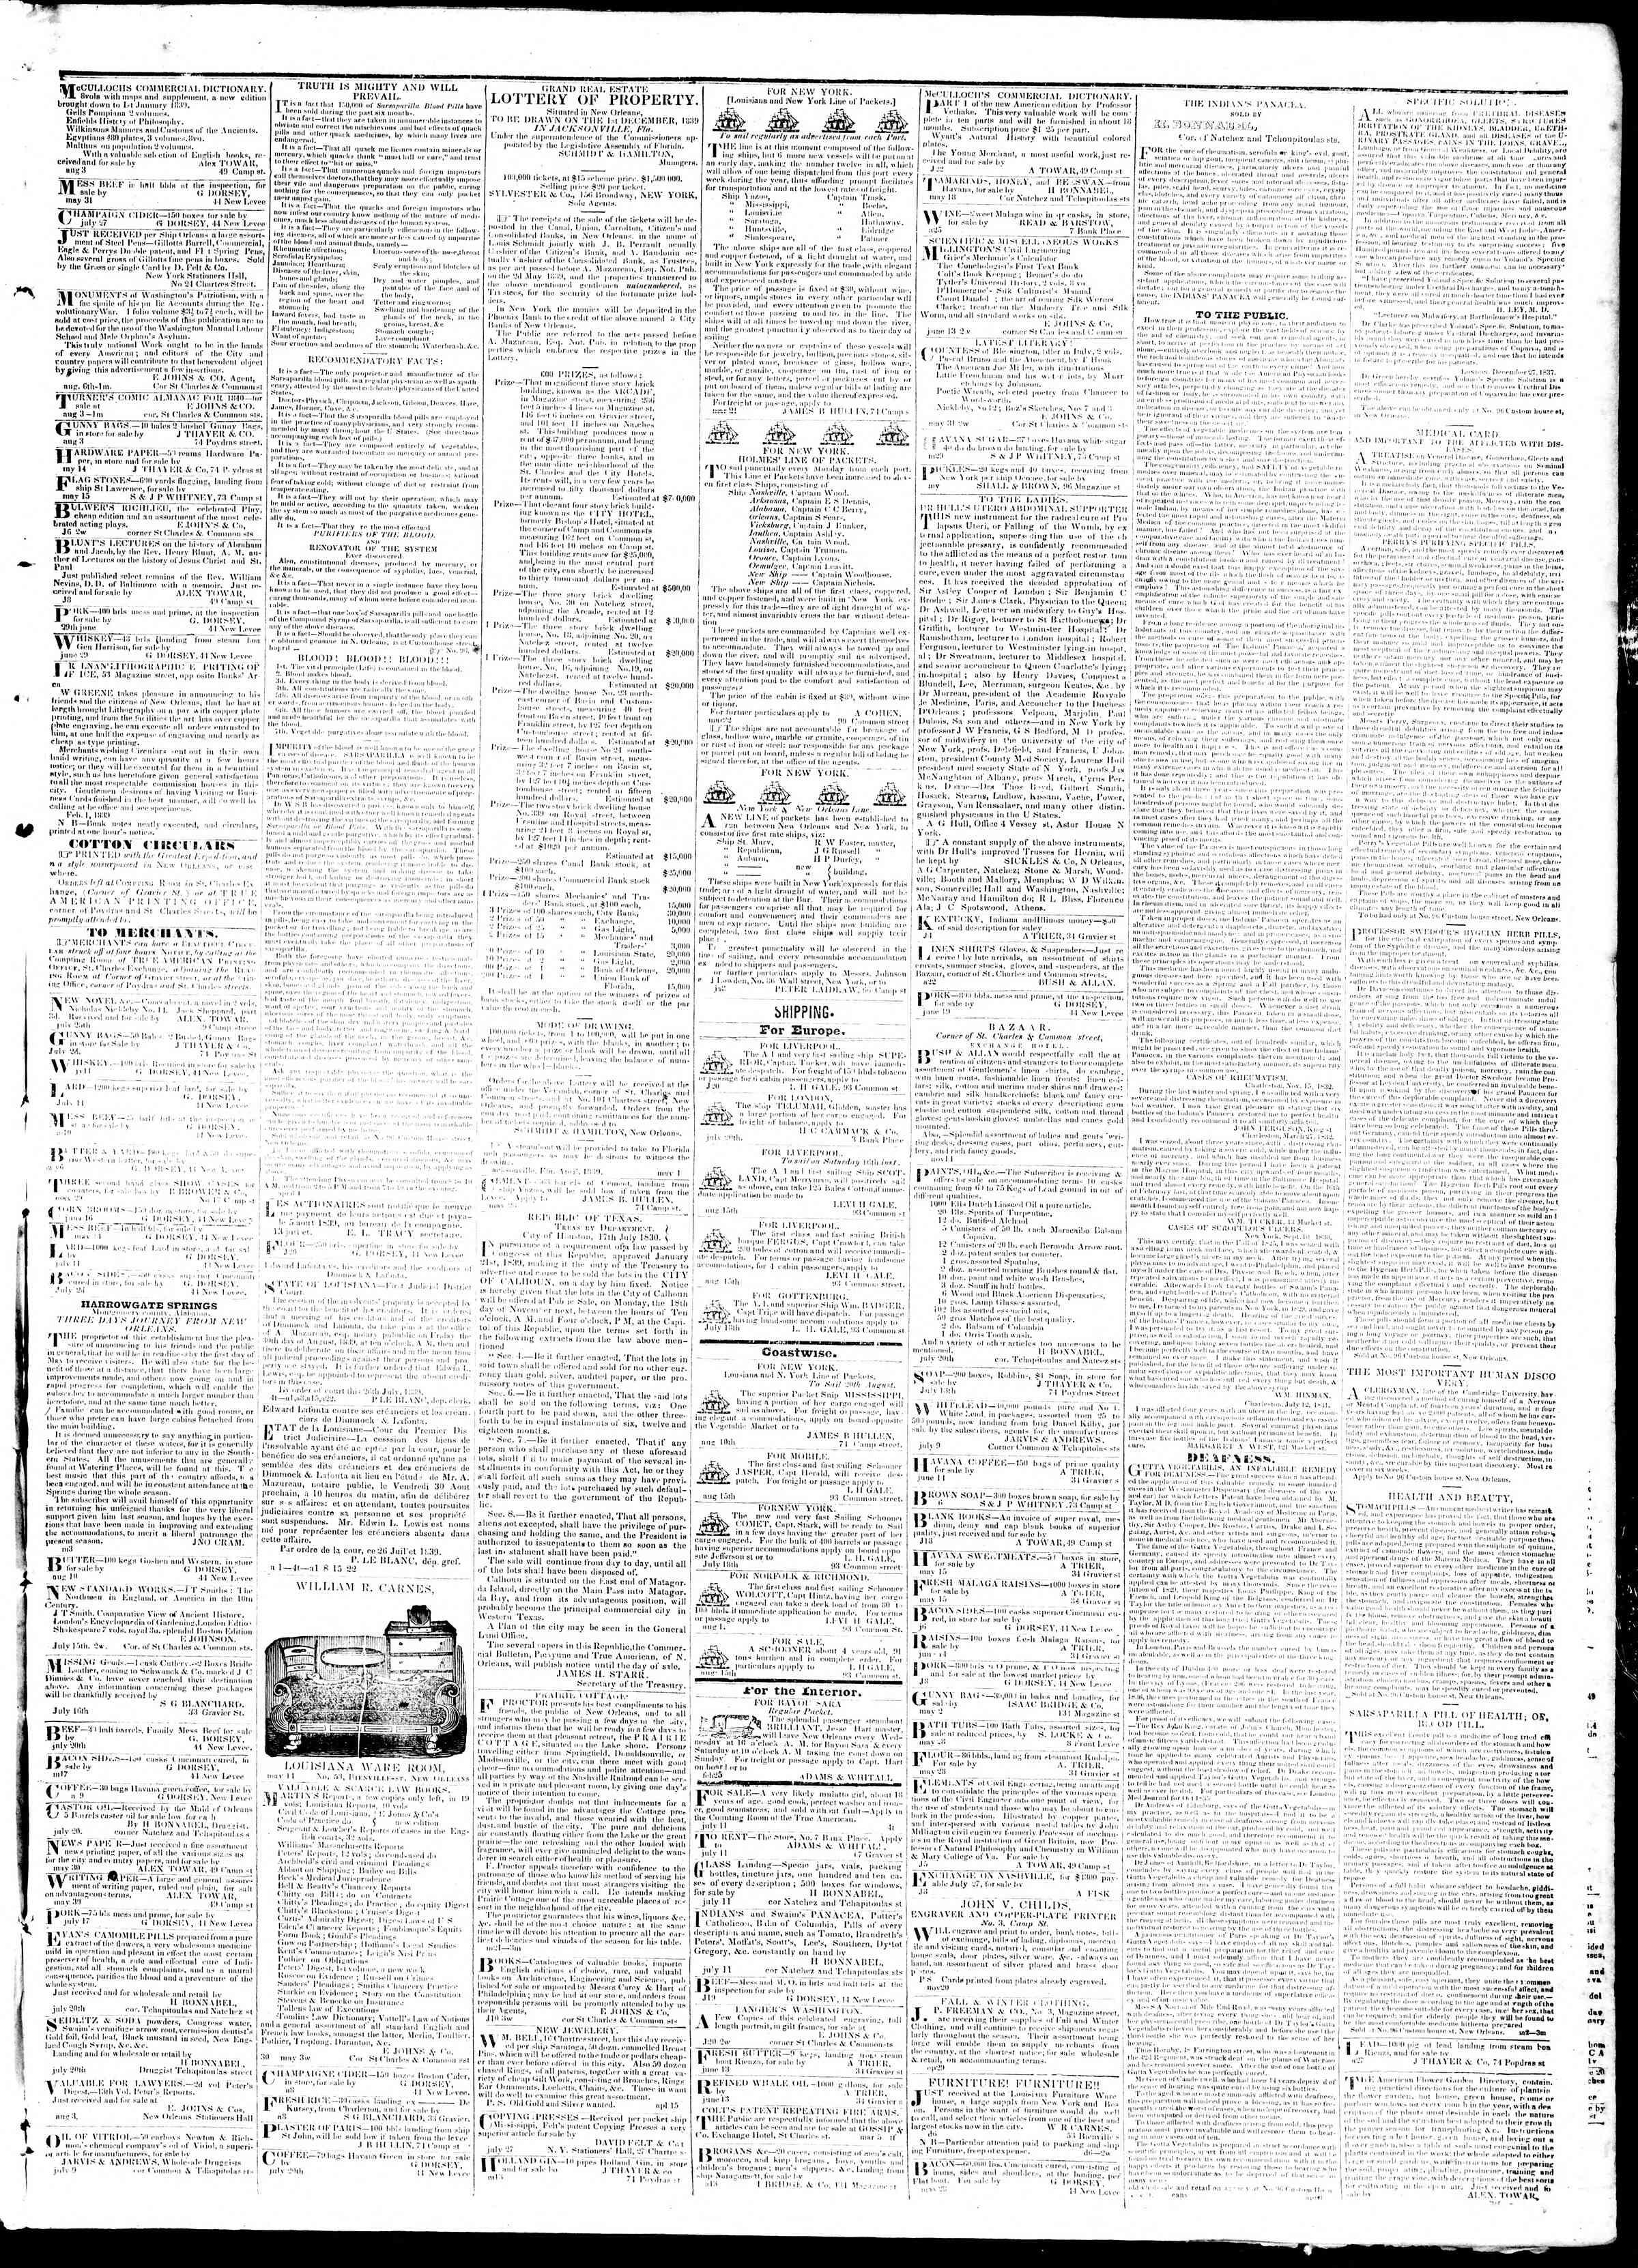 August 17, 1839 Tarihli True American Gazetesi Sayfa 3